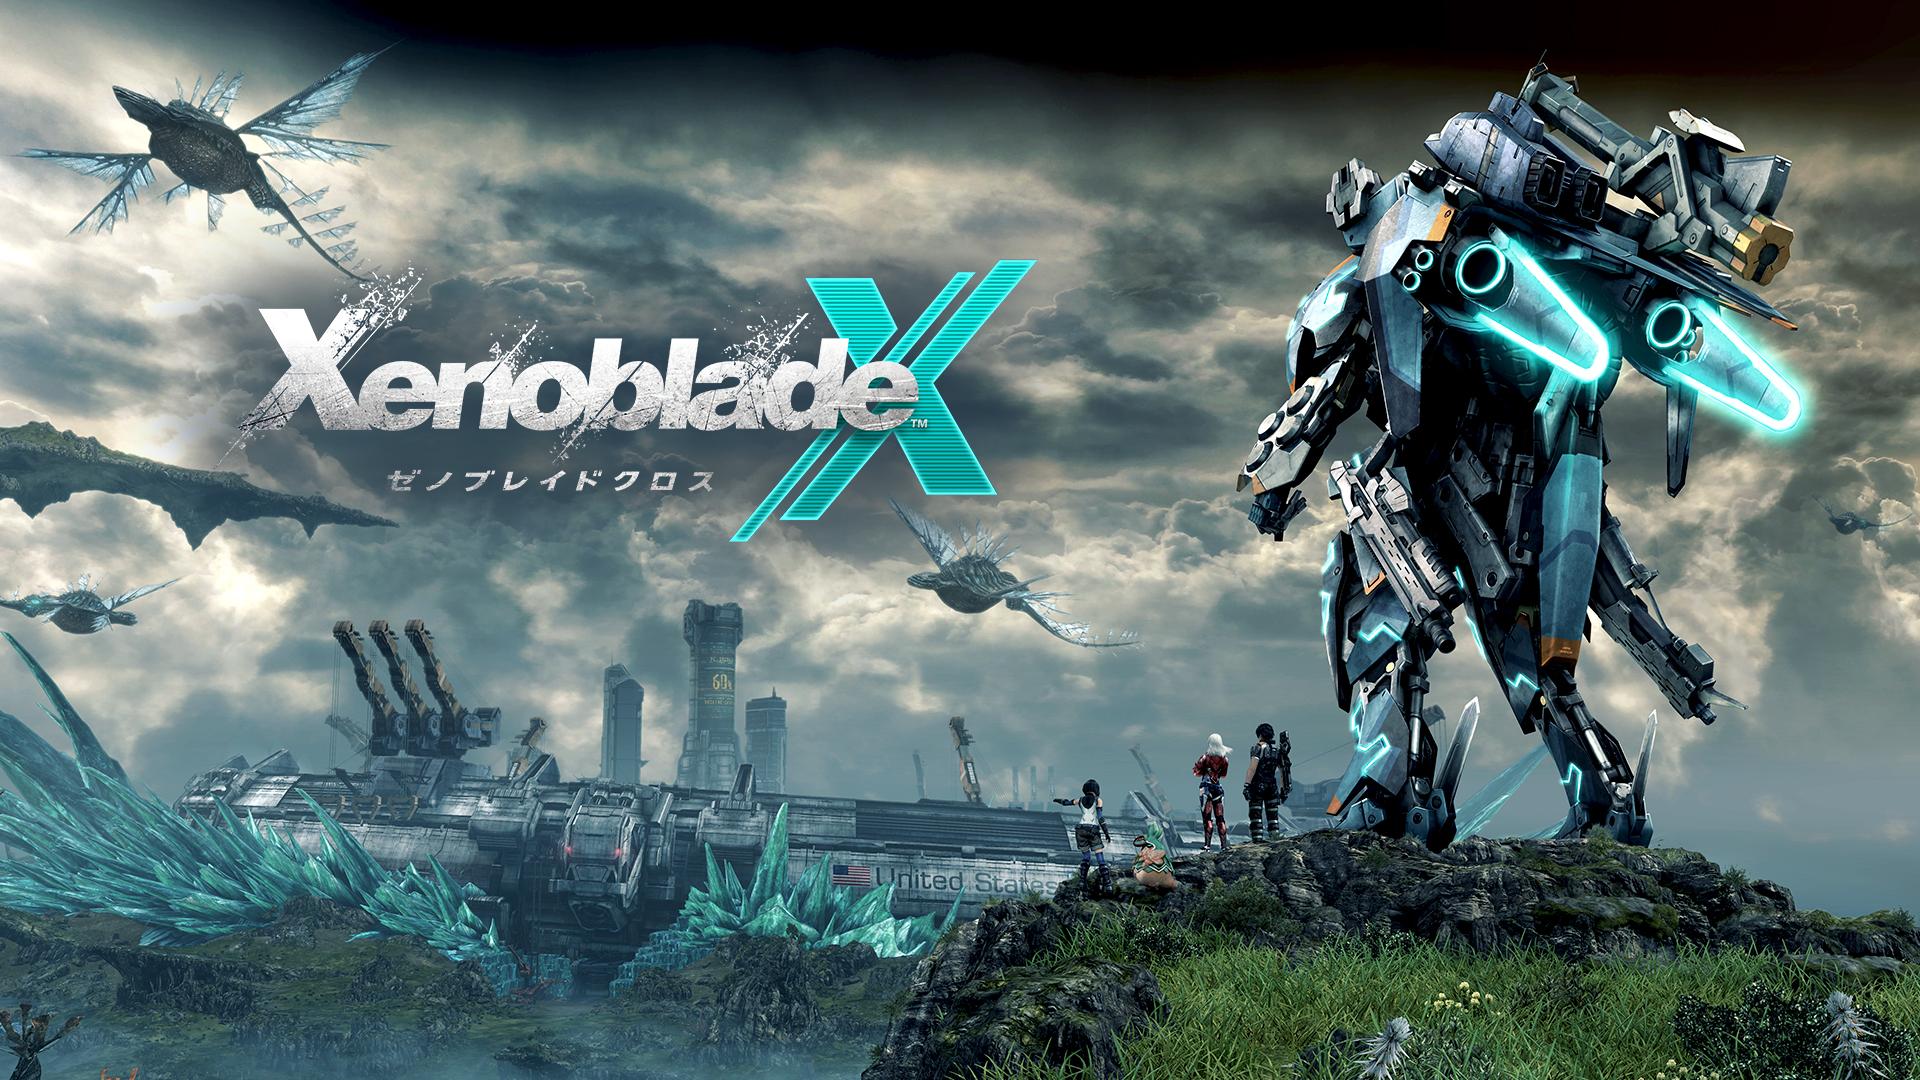 XenobladeX ゼノブレイドクロス | Wii U | 任天堂